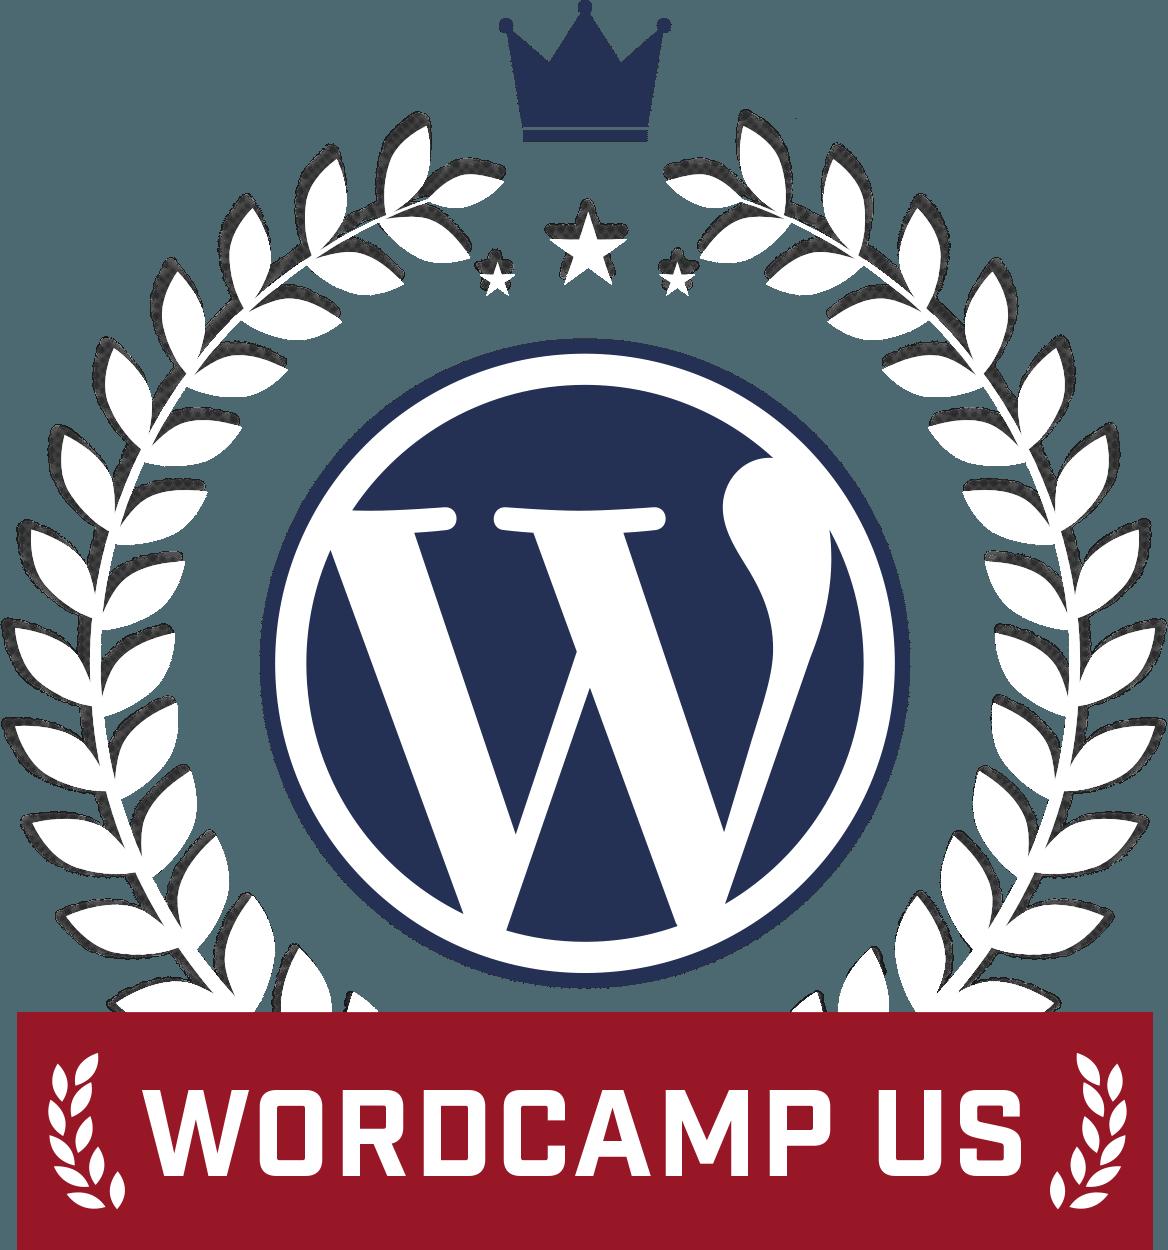 WordCamp US – December 4 – 6, 2015